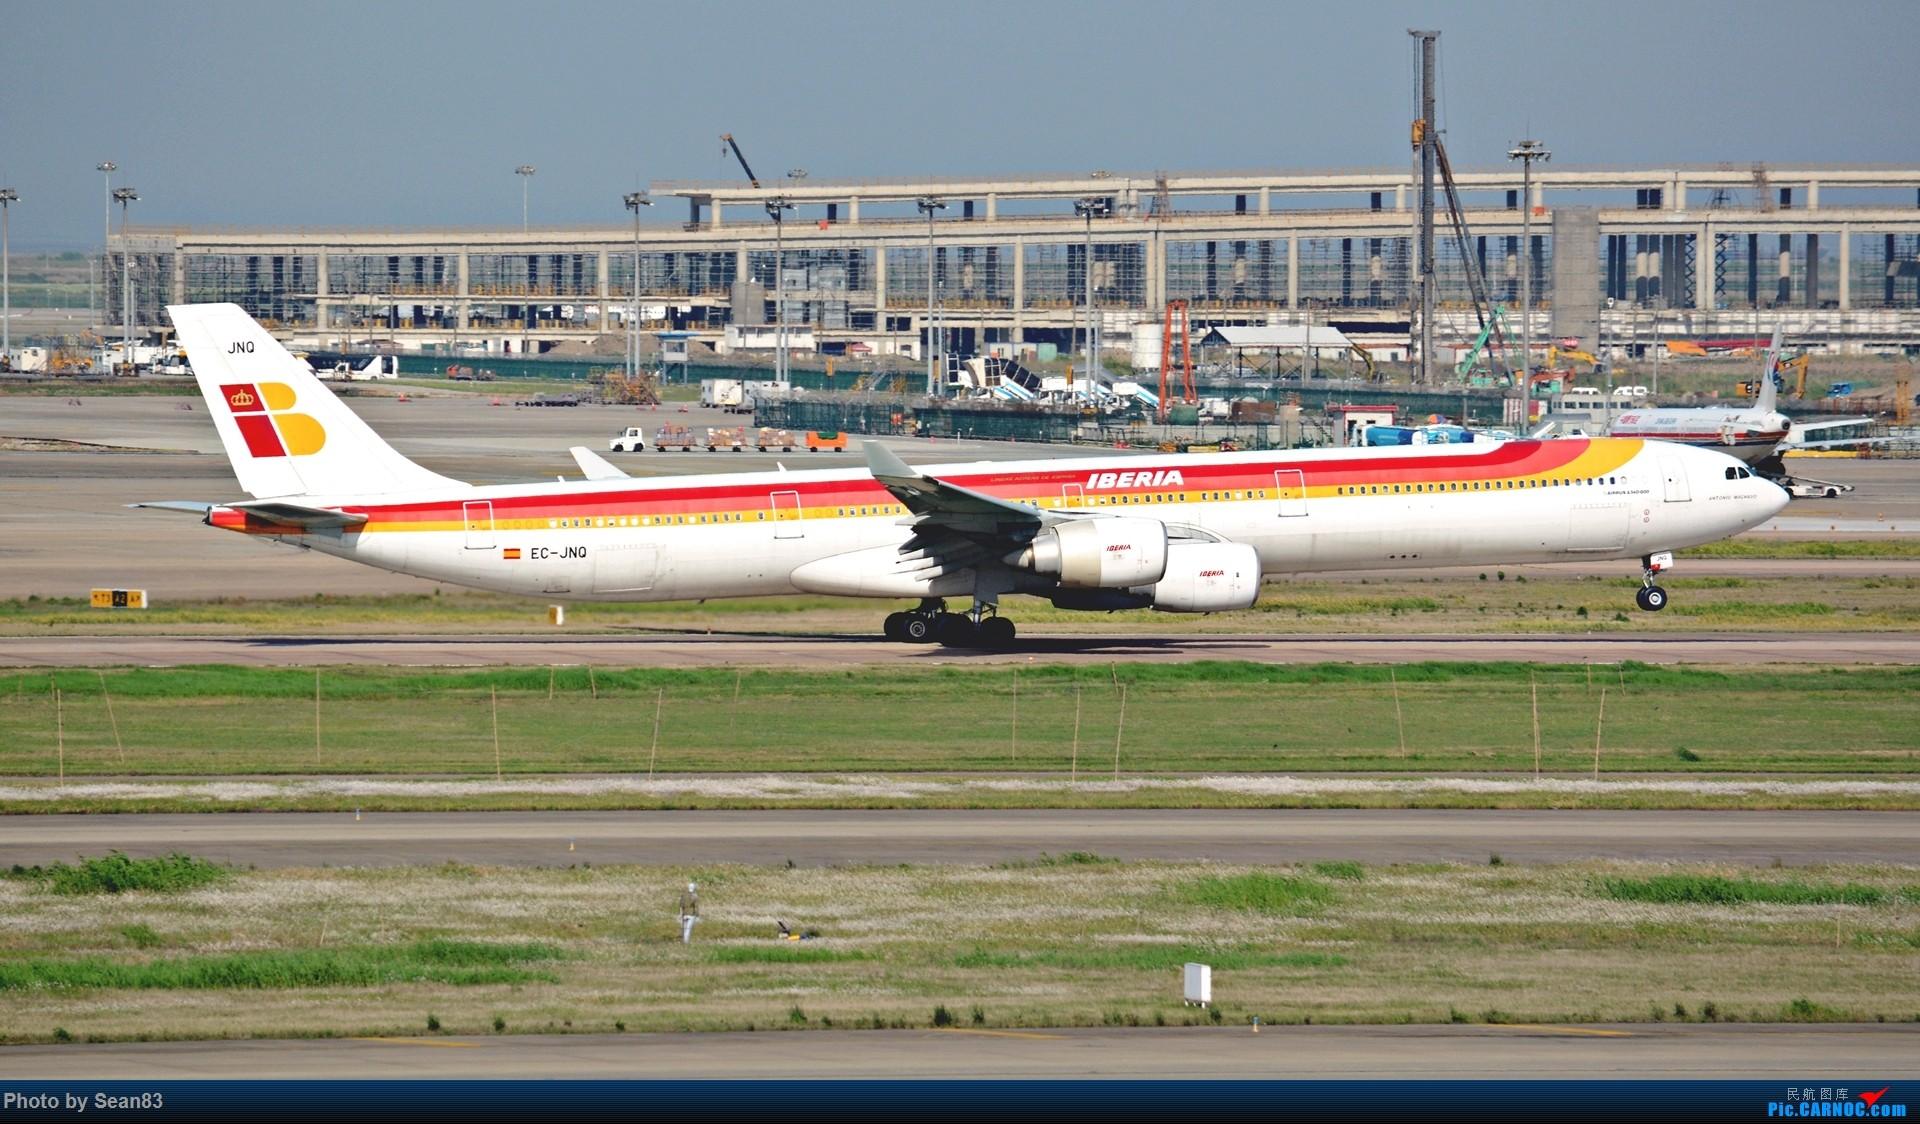 Re:[原创](1920*1080)放出一组壁纸 AIRBUS A340-600 EC-JNQ 上海浦东国际机场